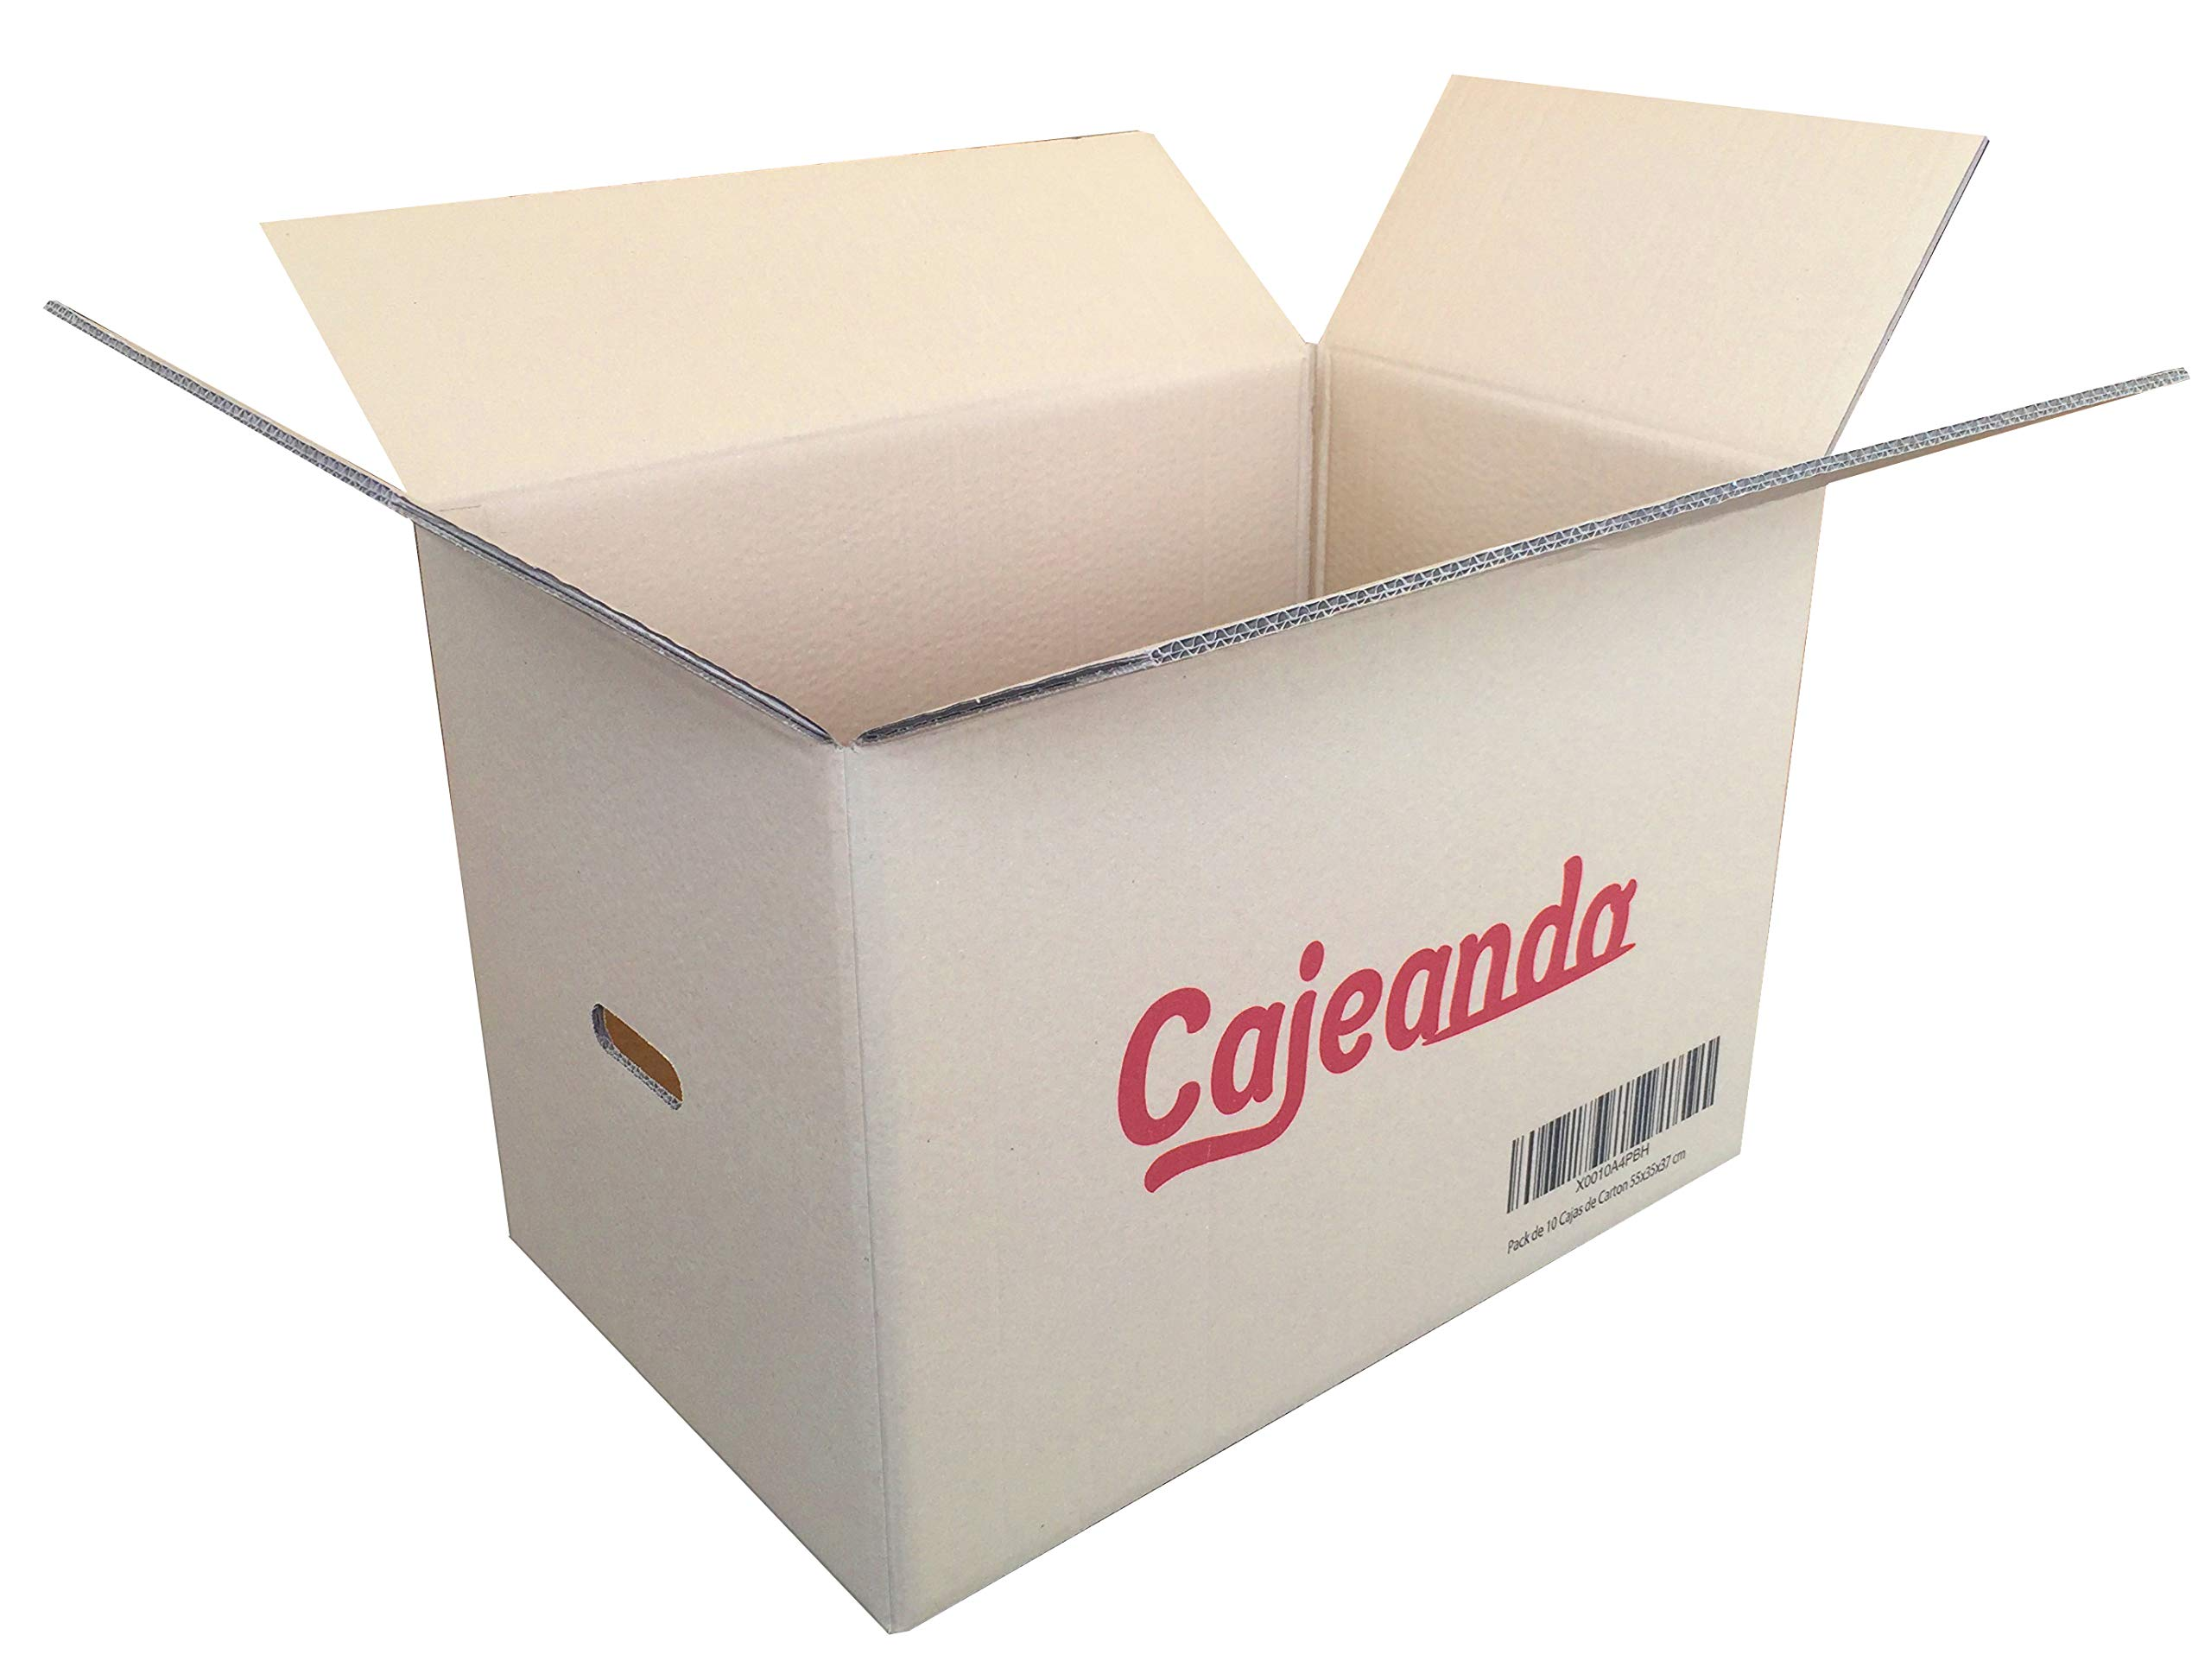 Cajeando | Pack de 10 Cajas de Cartón con Asas | Tamaño 55 x 35 x ...